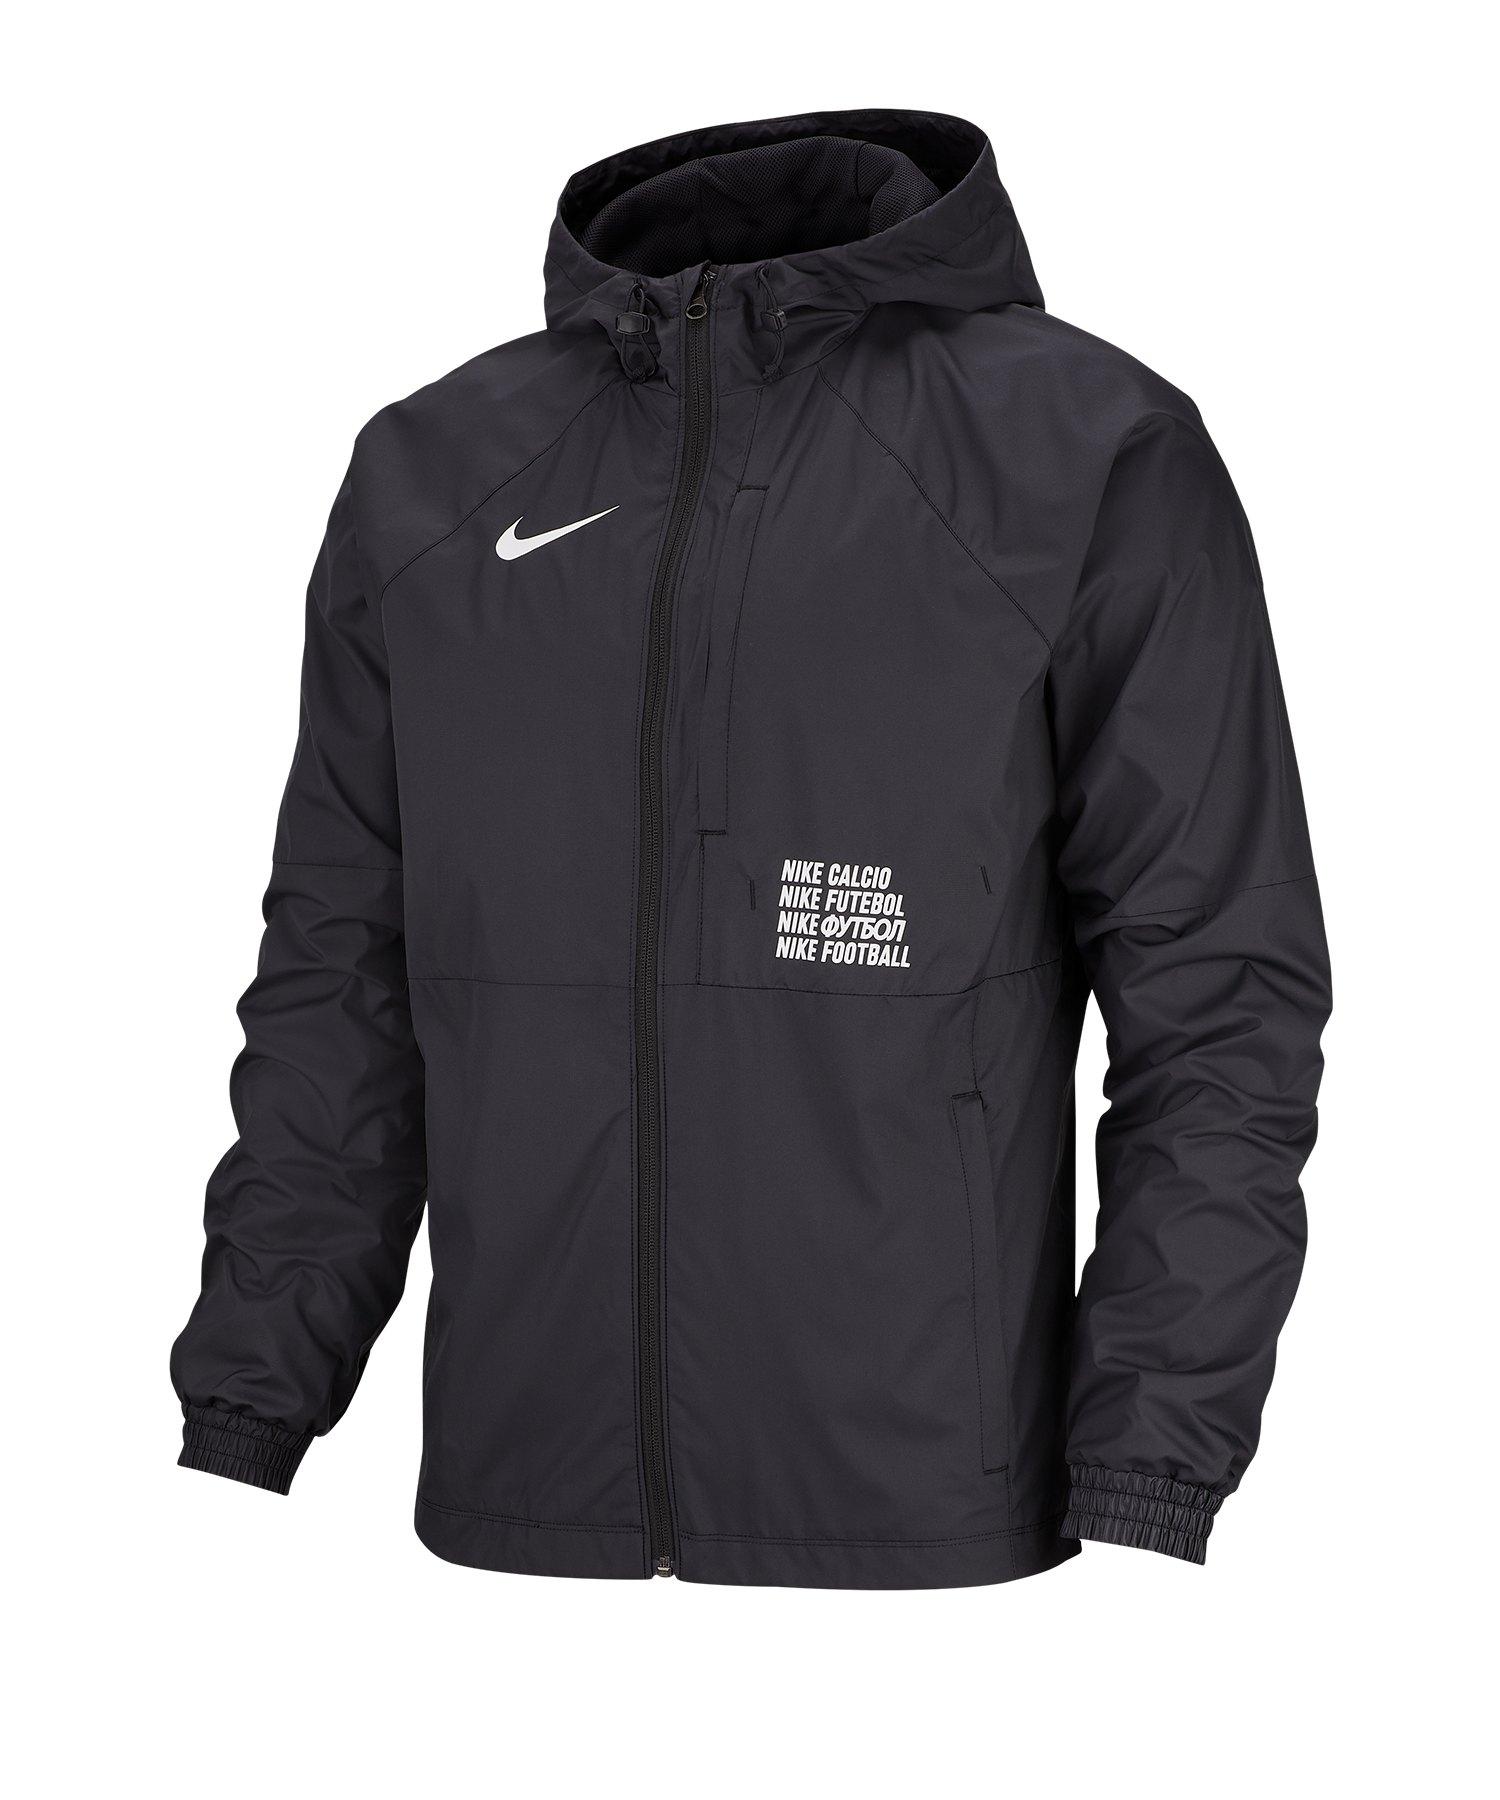 Nike F.C. Windrunner Jacke Schwarz F010 - schwarz